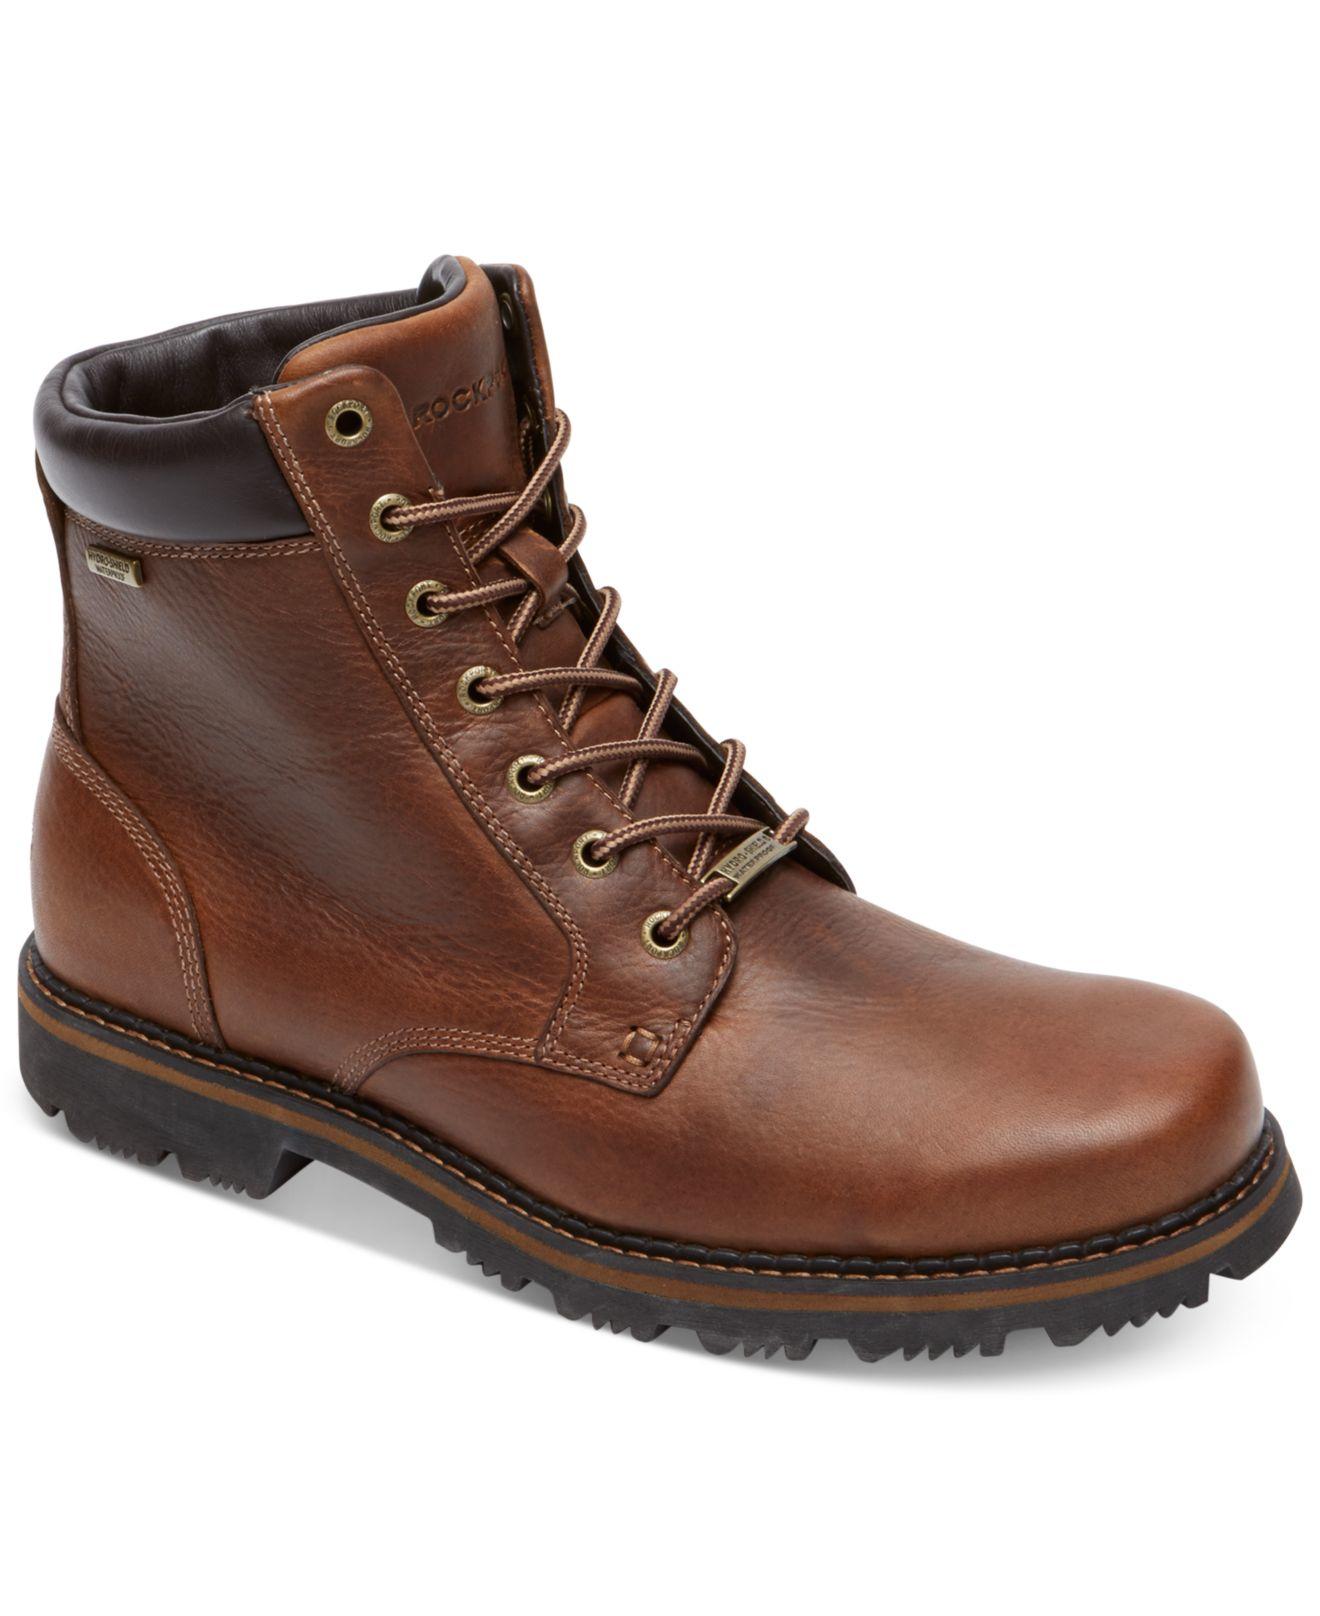 Lyst Rockport Gentry Pt Waterproof Boots In Brown For Men